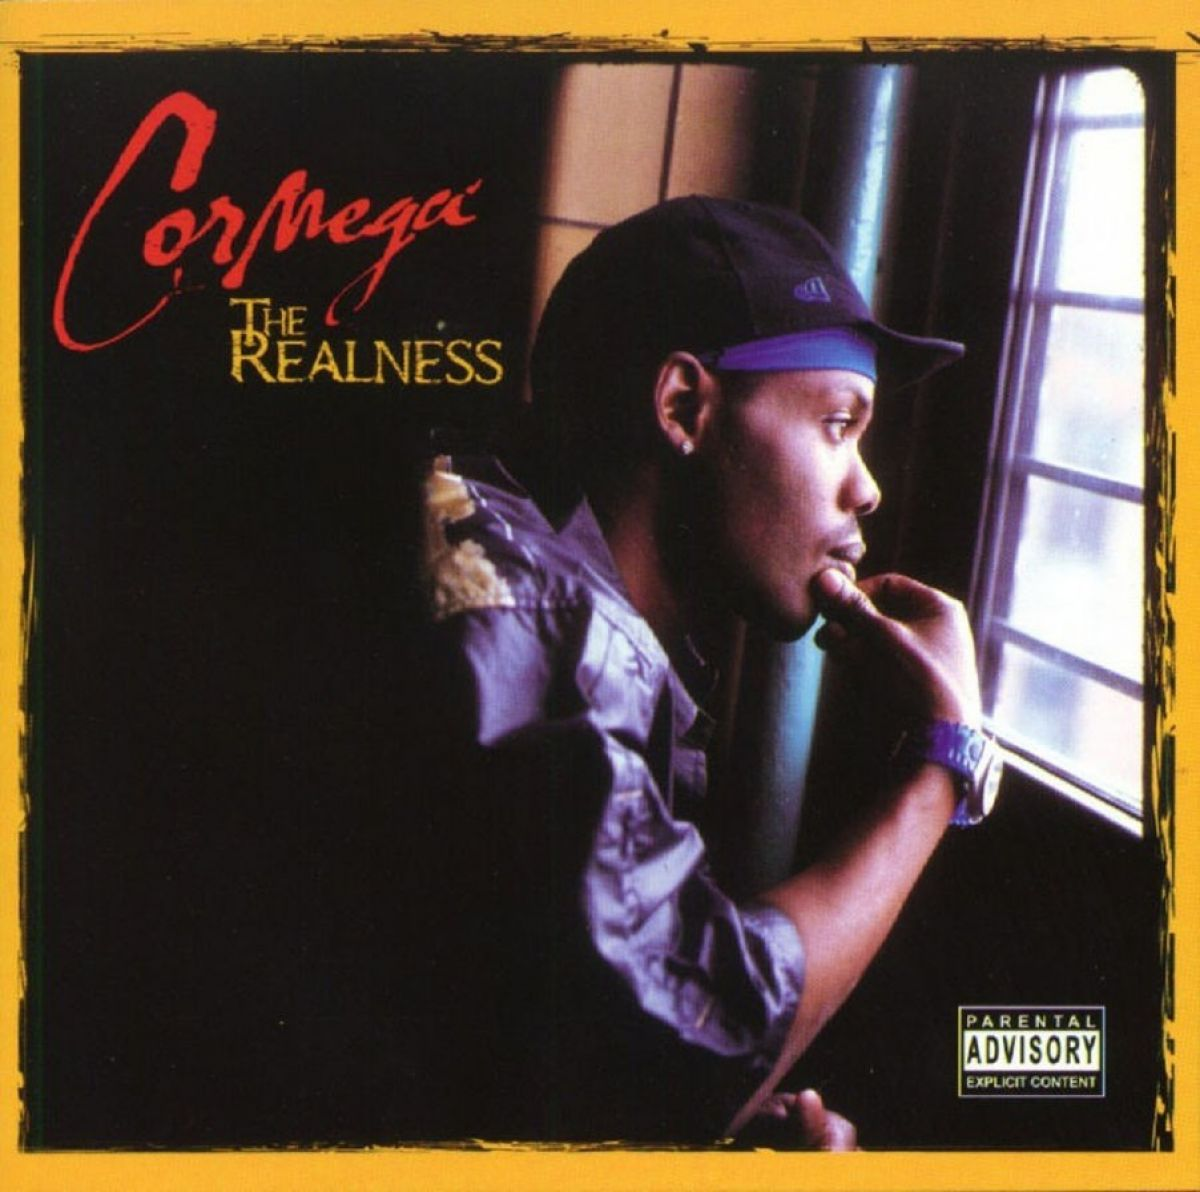 5617_cormega_the_realness_frontal